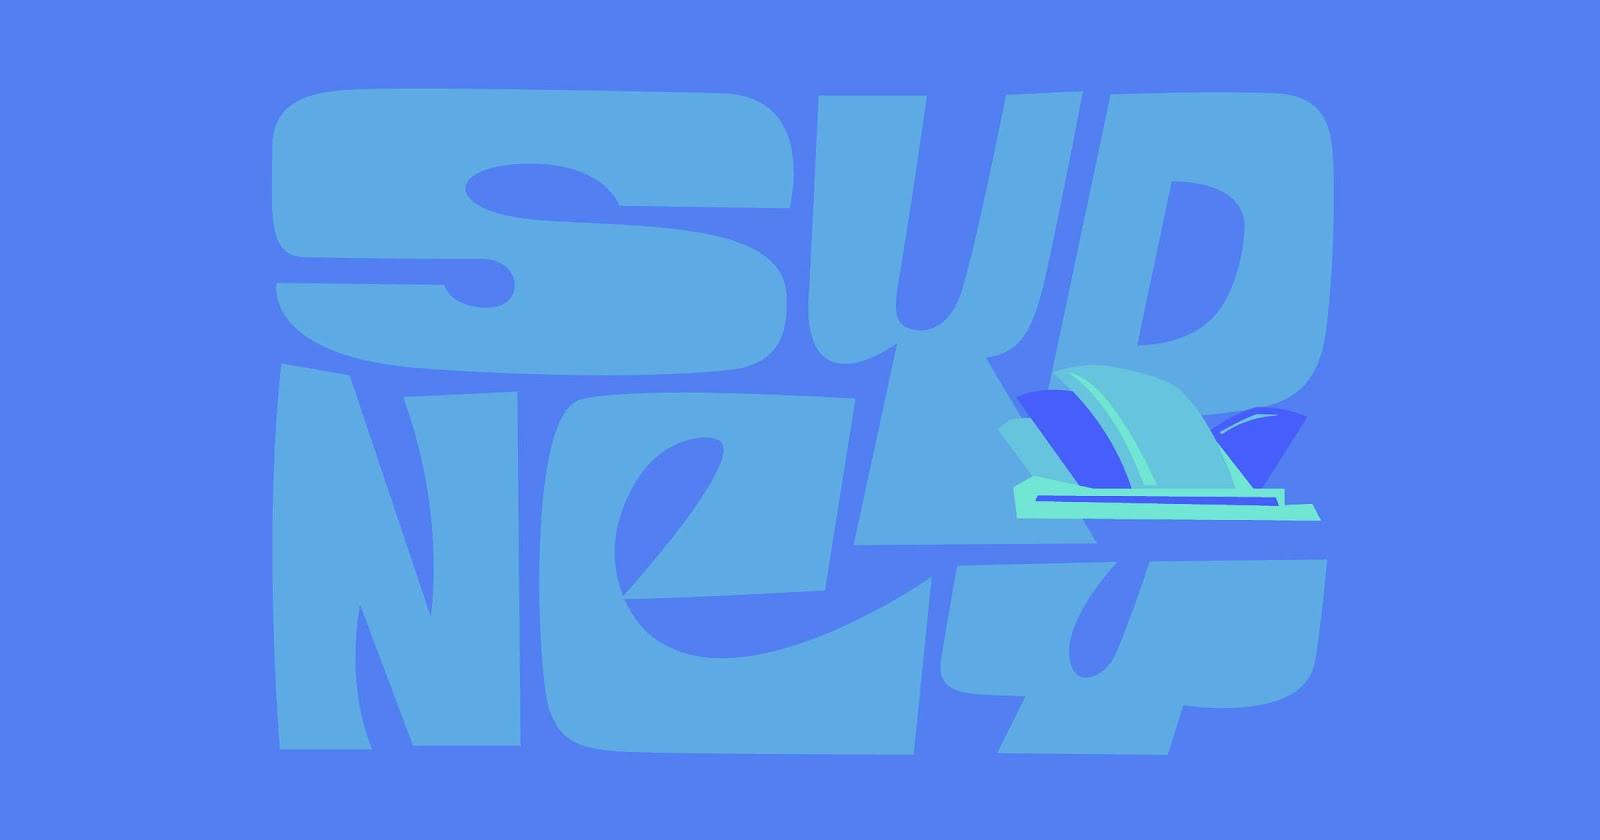 sydney world tour